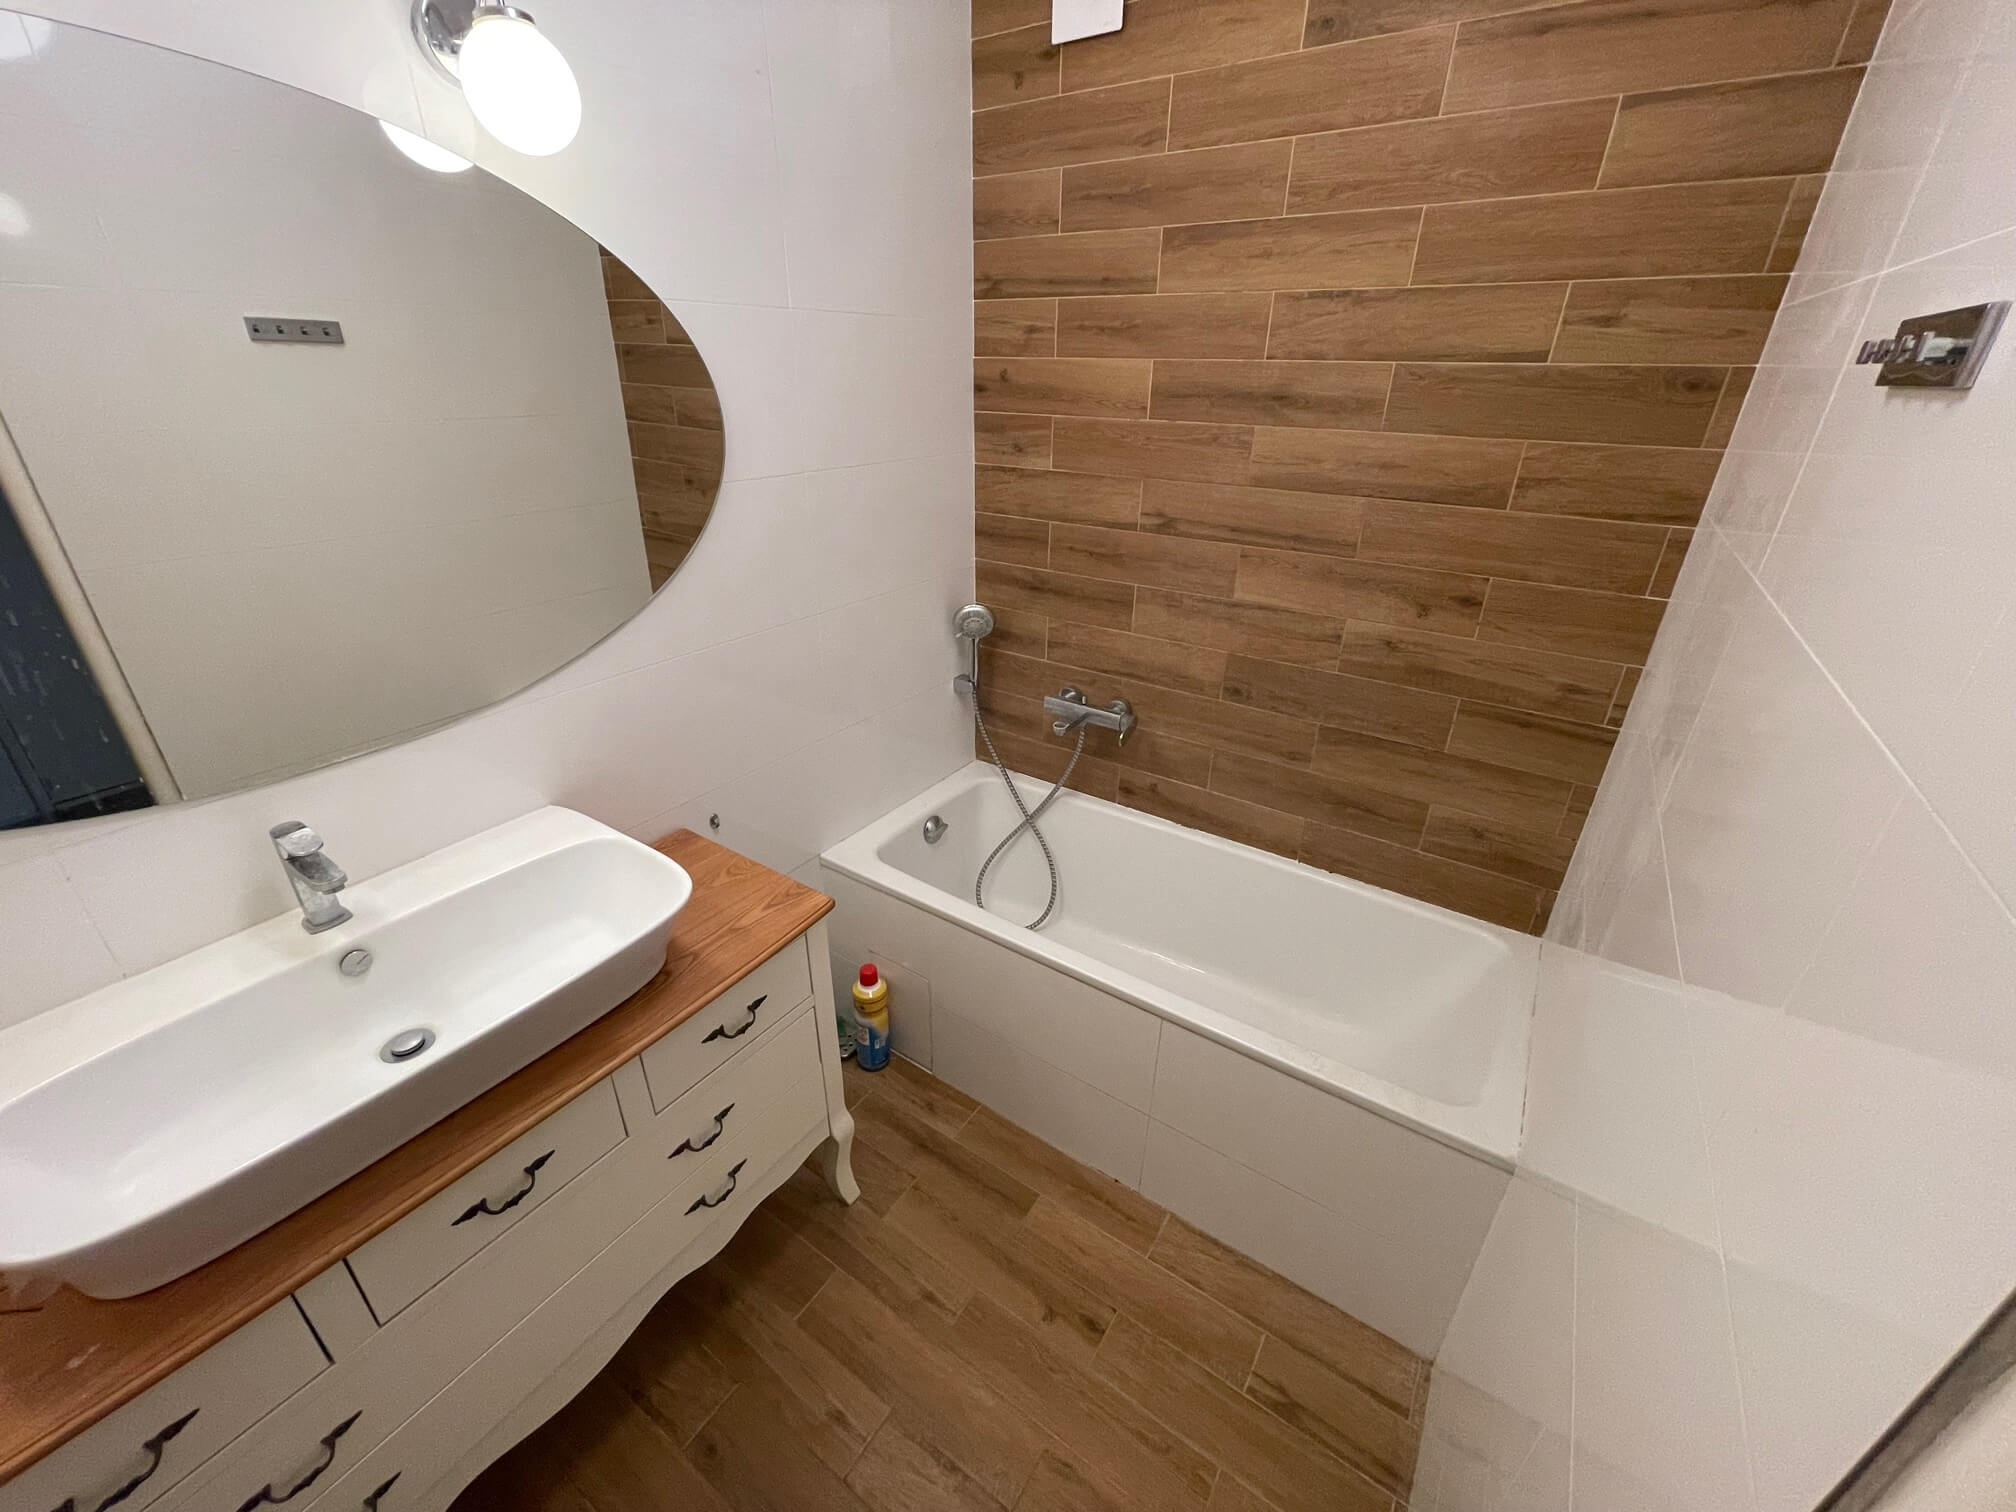 Exkluzívne na prenájom 3 izbový byt, 83m2, 2x loggia 4,5m2, Karolovka, Janotová 8-14